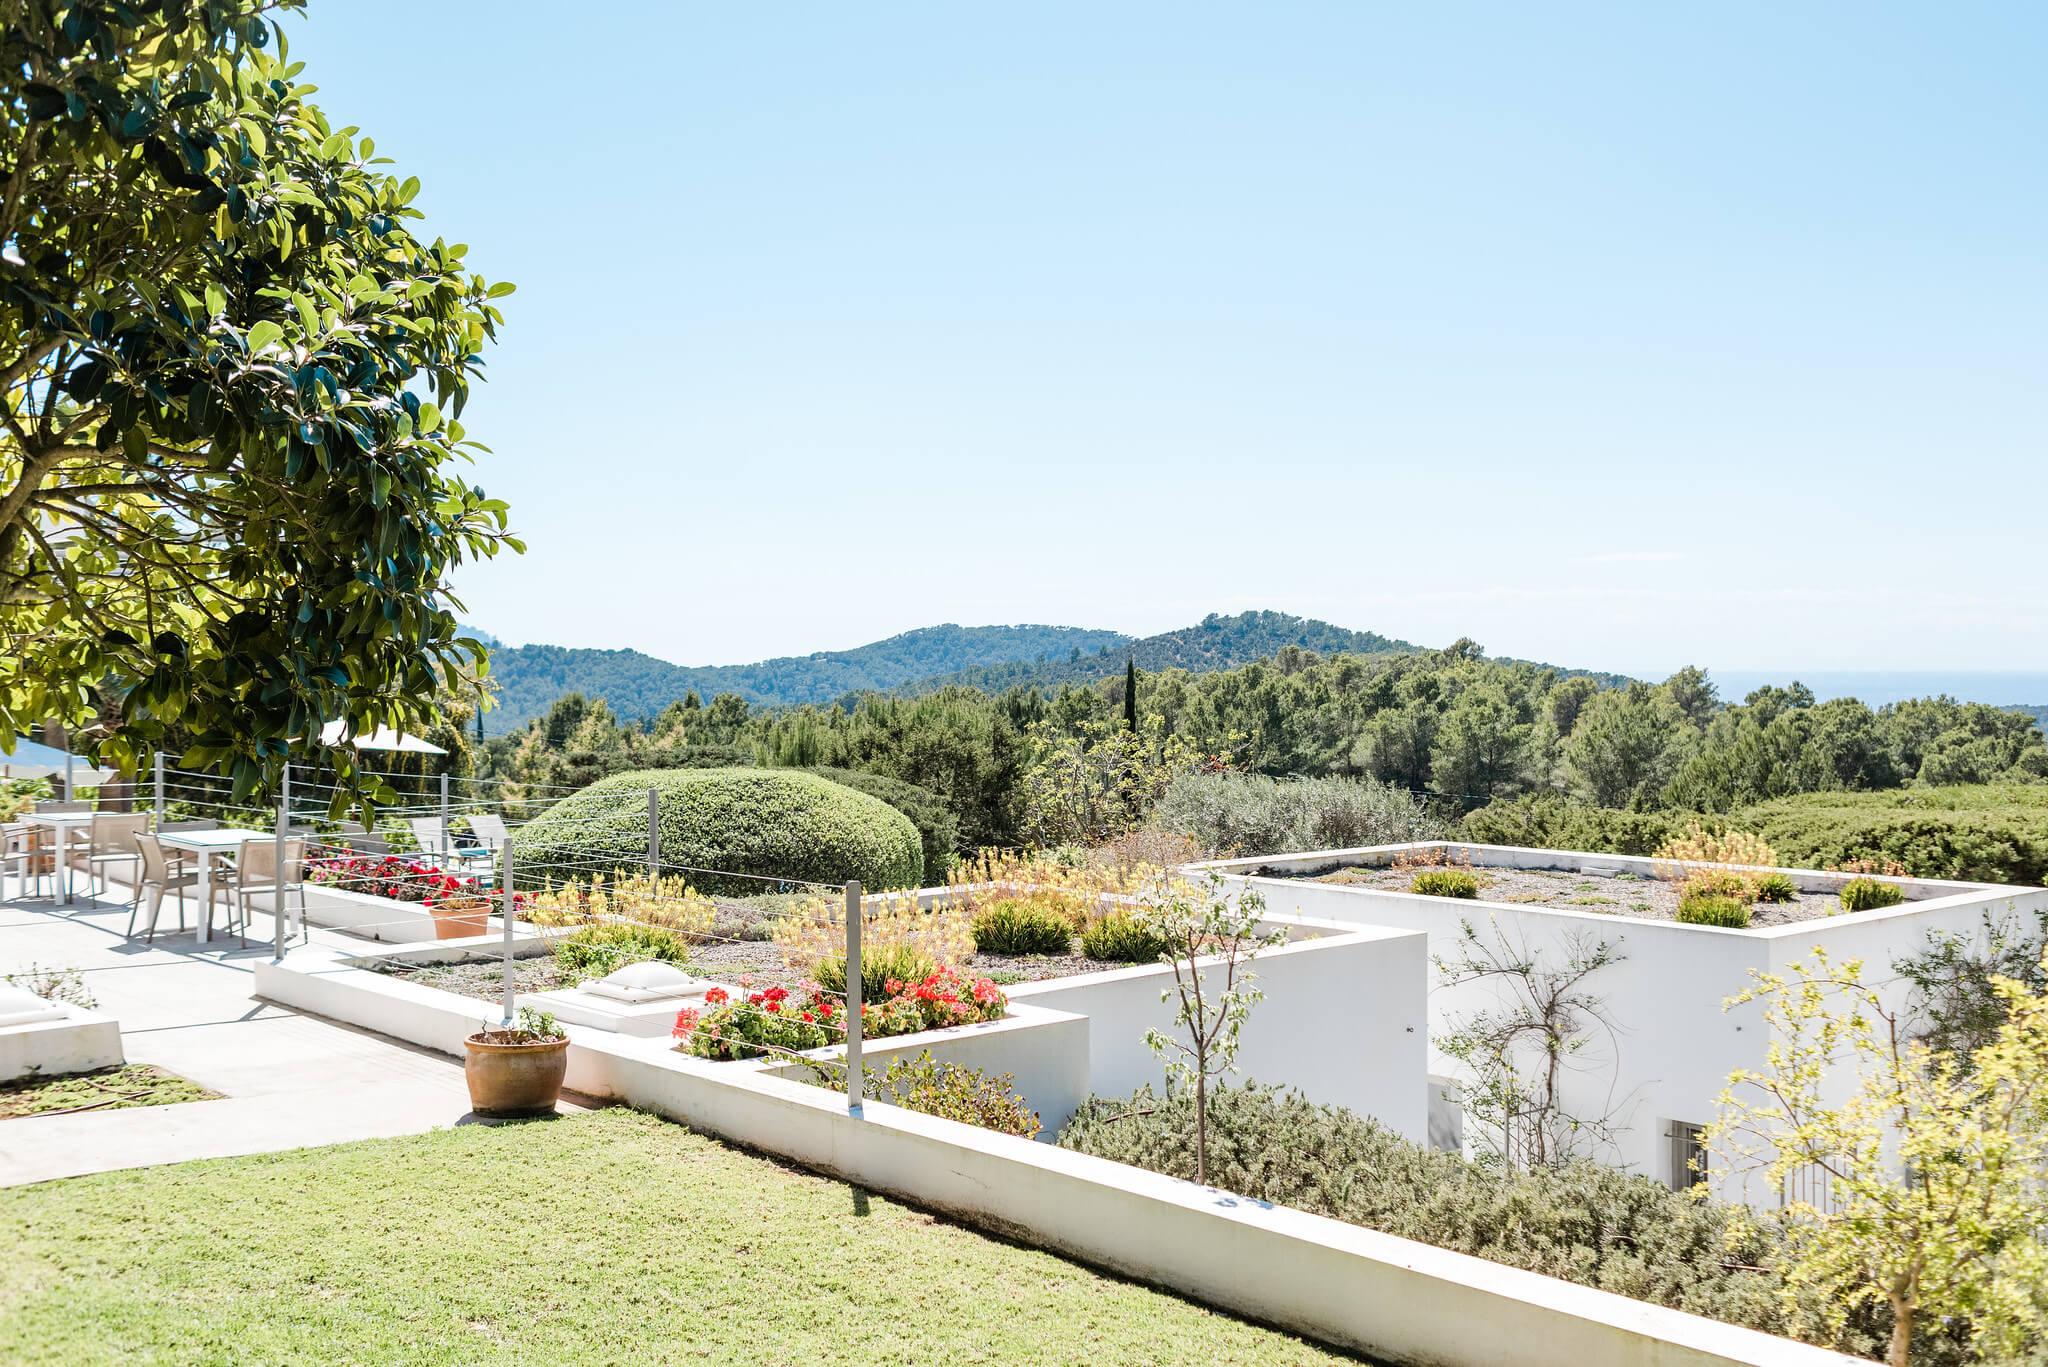 https://www.white-ibiza.com/wp-content/uploads/2020/06/white-ibiza-villas-casa-nyah-exterior-view-grass.jpg